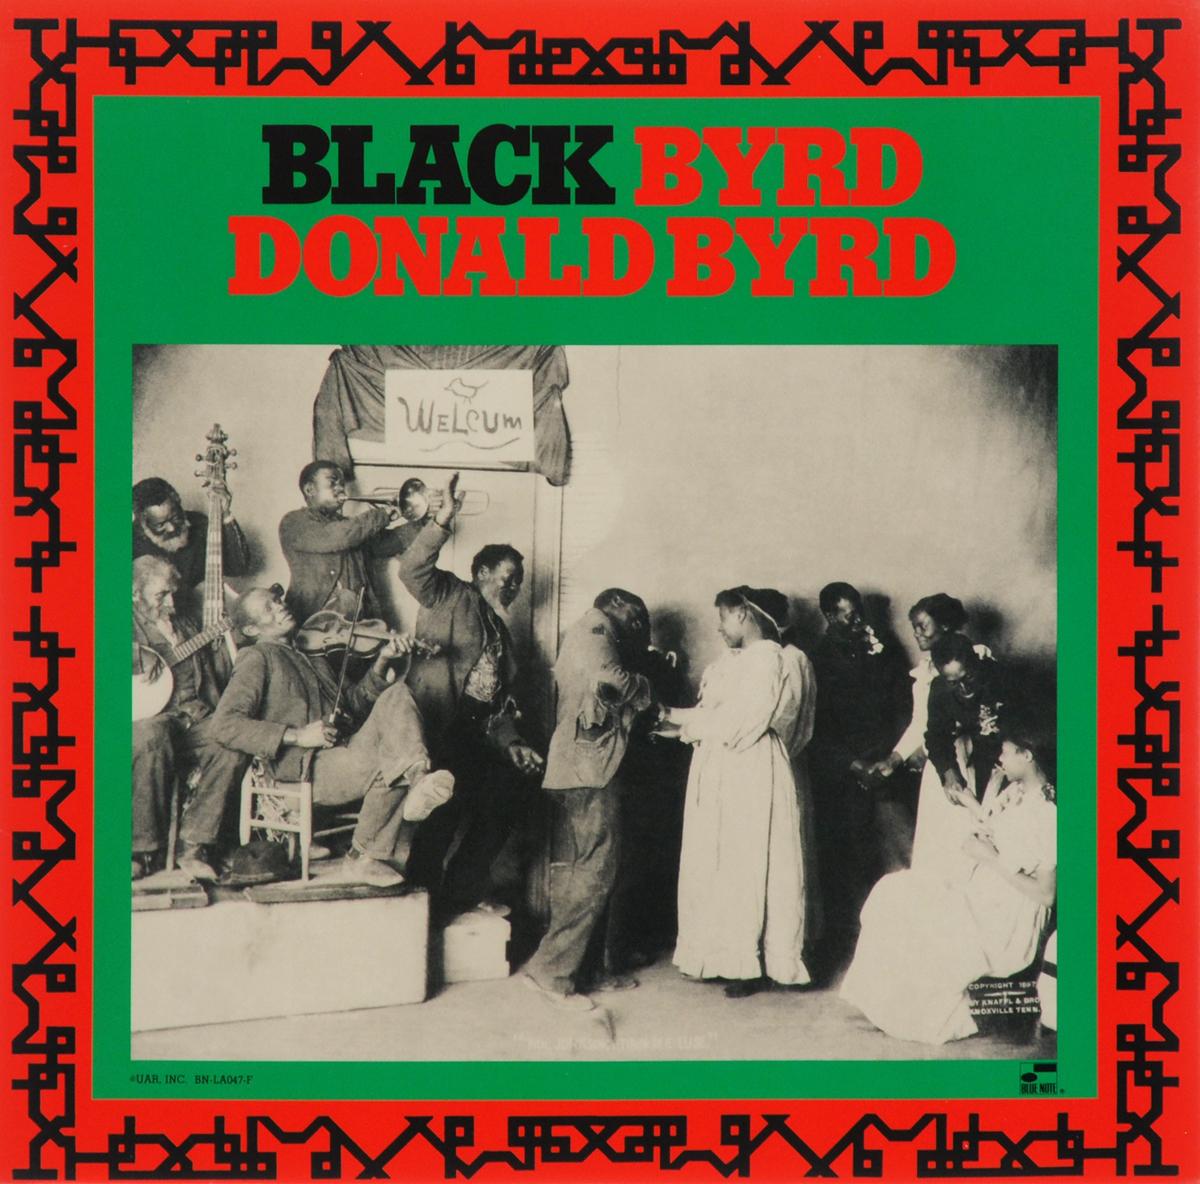 Дональд Берд Donald Byrd. Black Byrd (LP) w byrd in nomine a 4